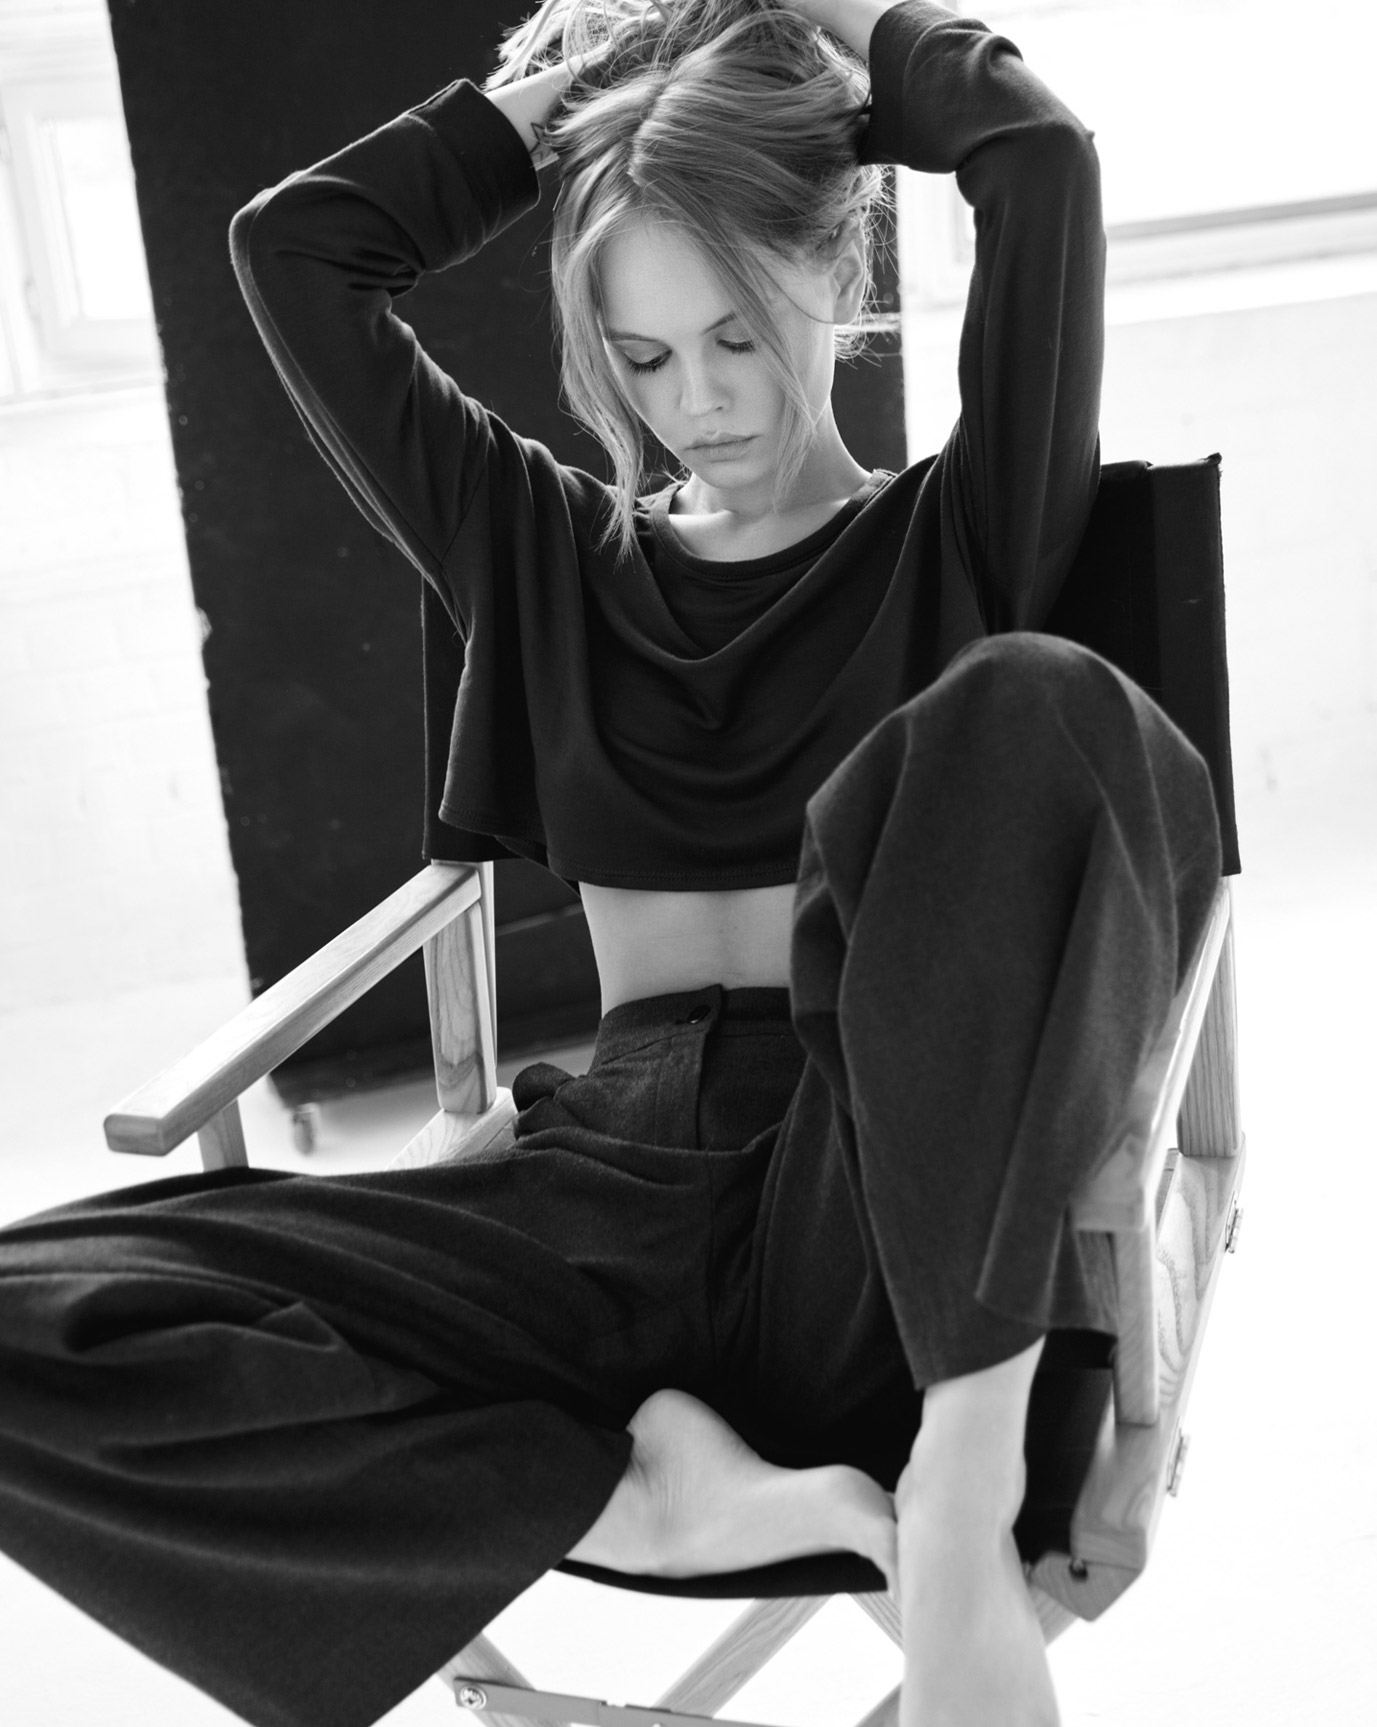 Анастасия Щеглова, фотограф Константин Крюковский / фото 05